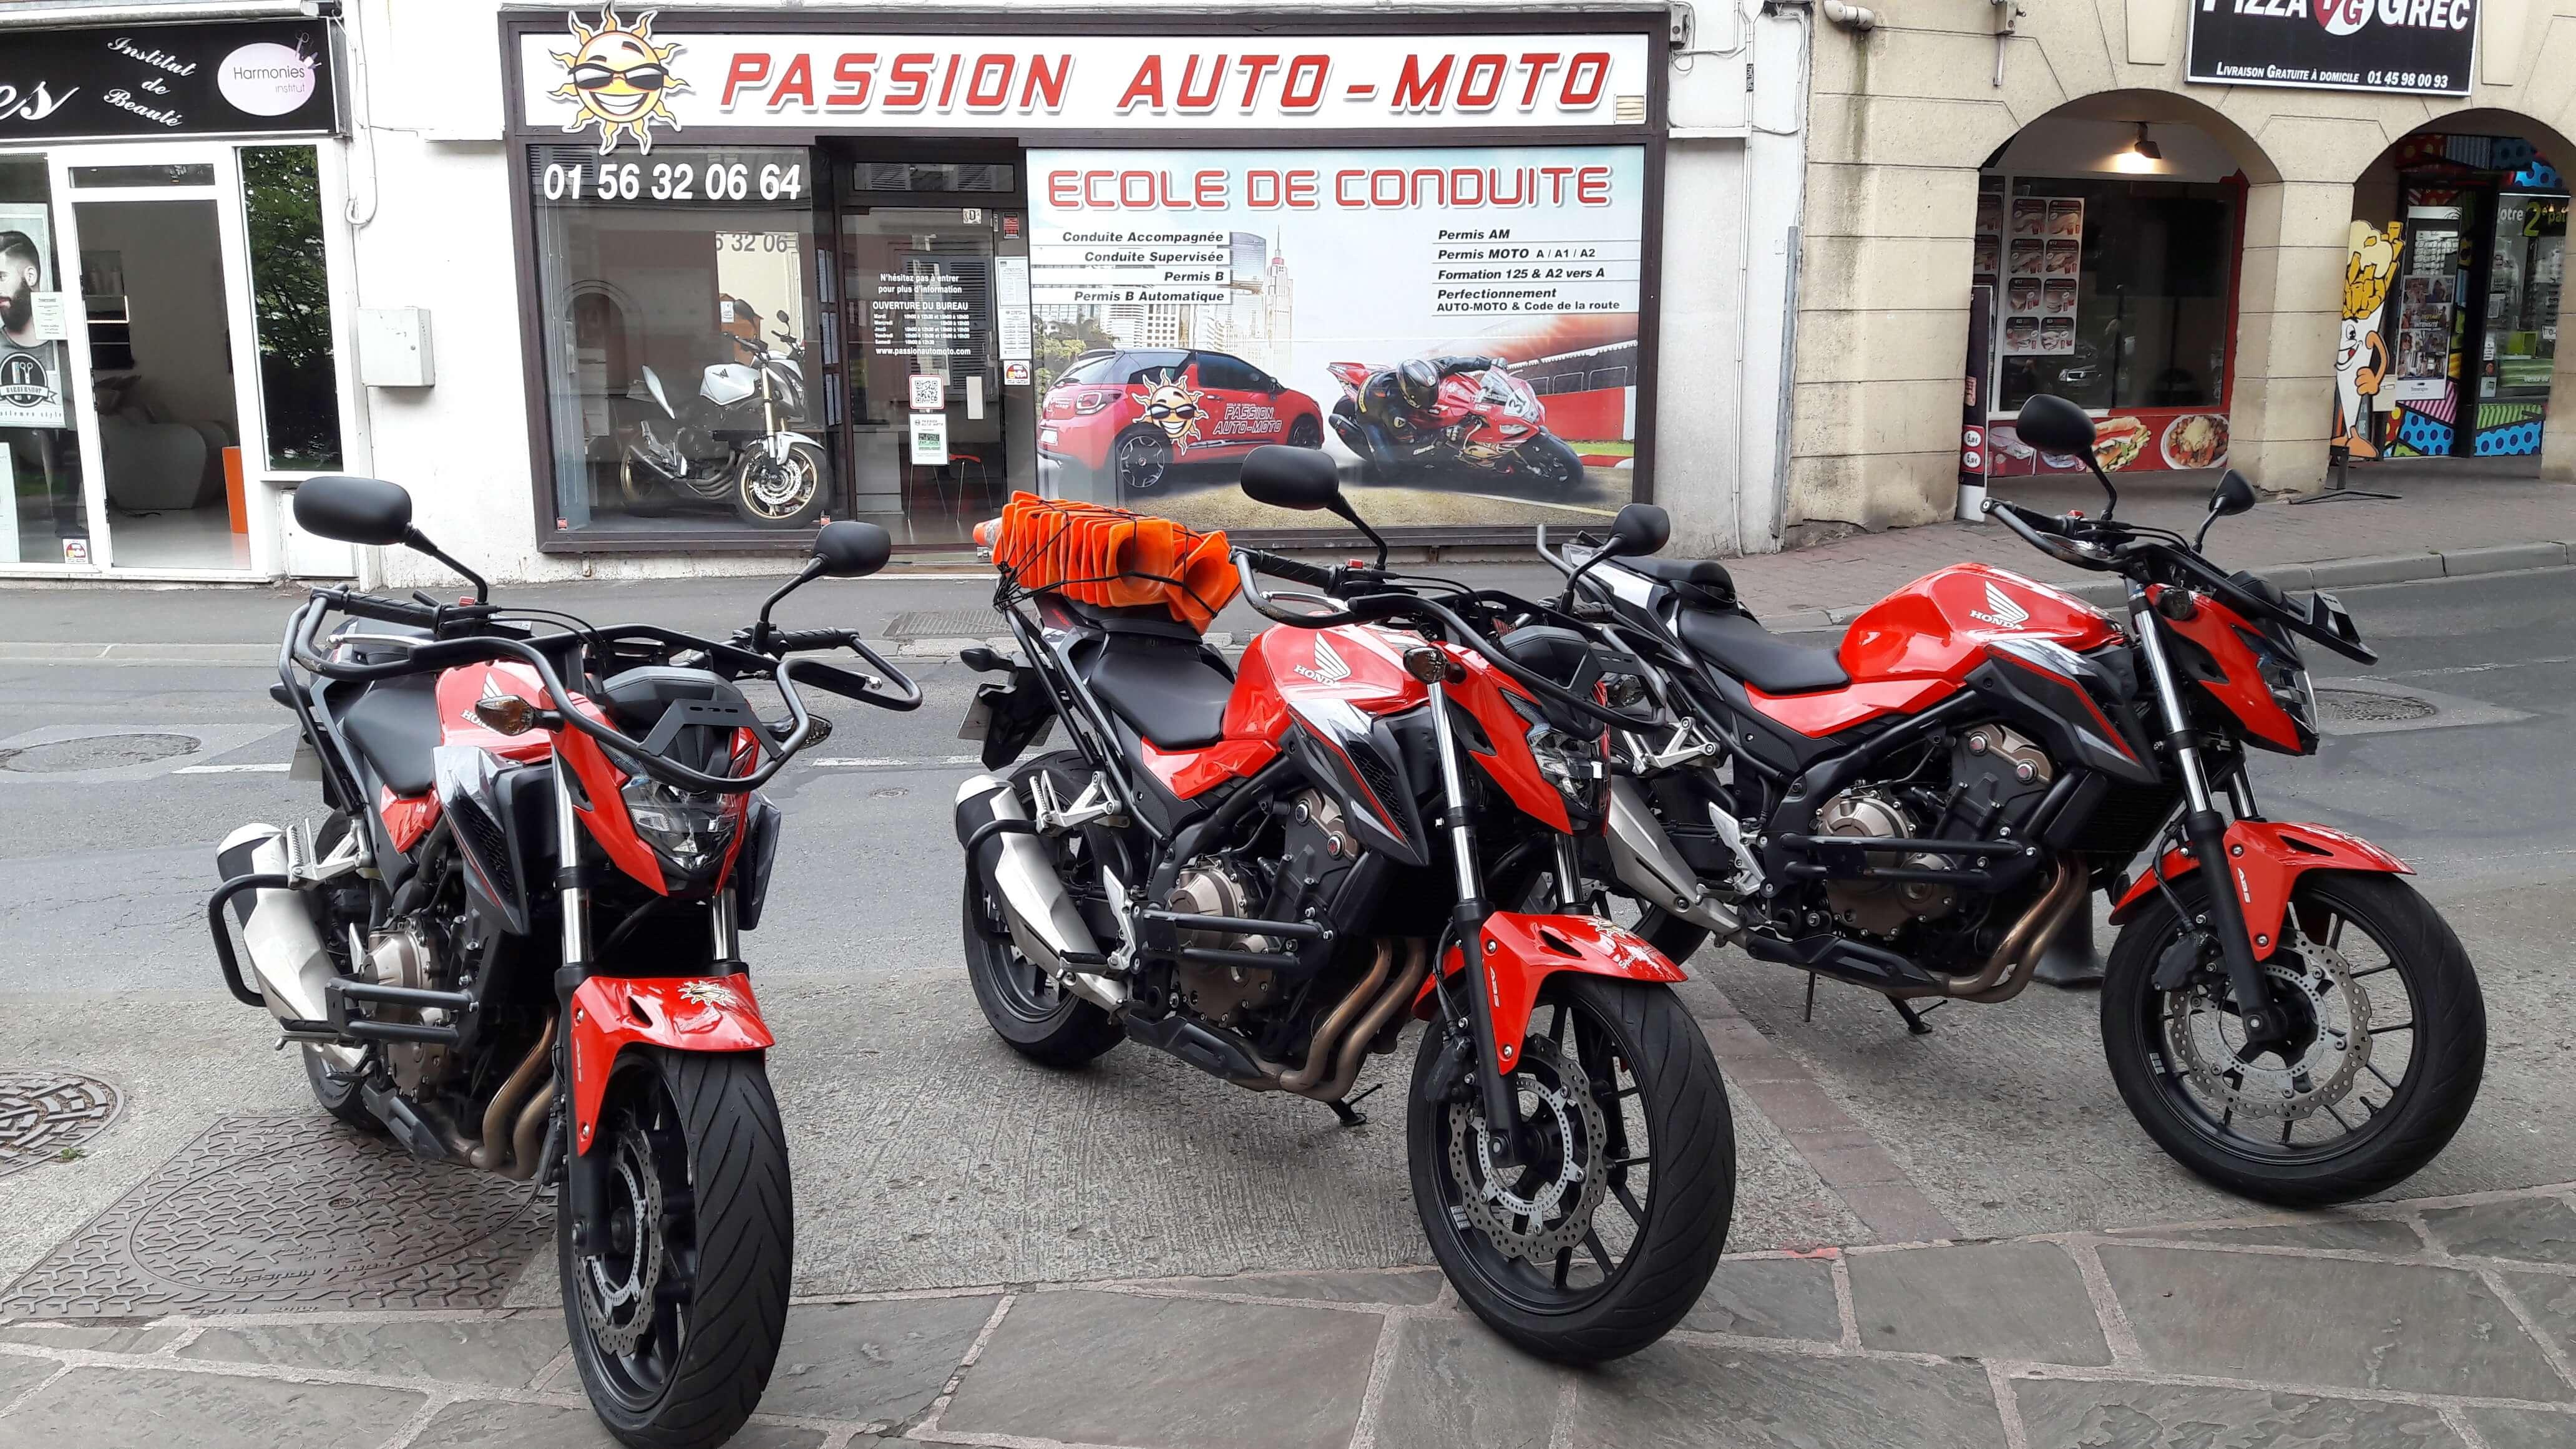 permis moto 77 94 auto moto villecresnes passion auto moto 94. Black Bedroom Furniture Sets. Home Design Ideas